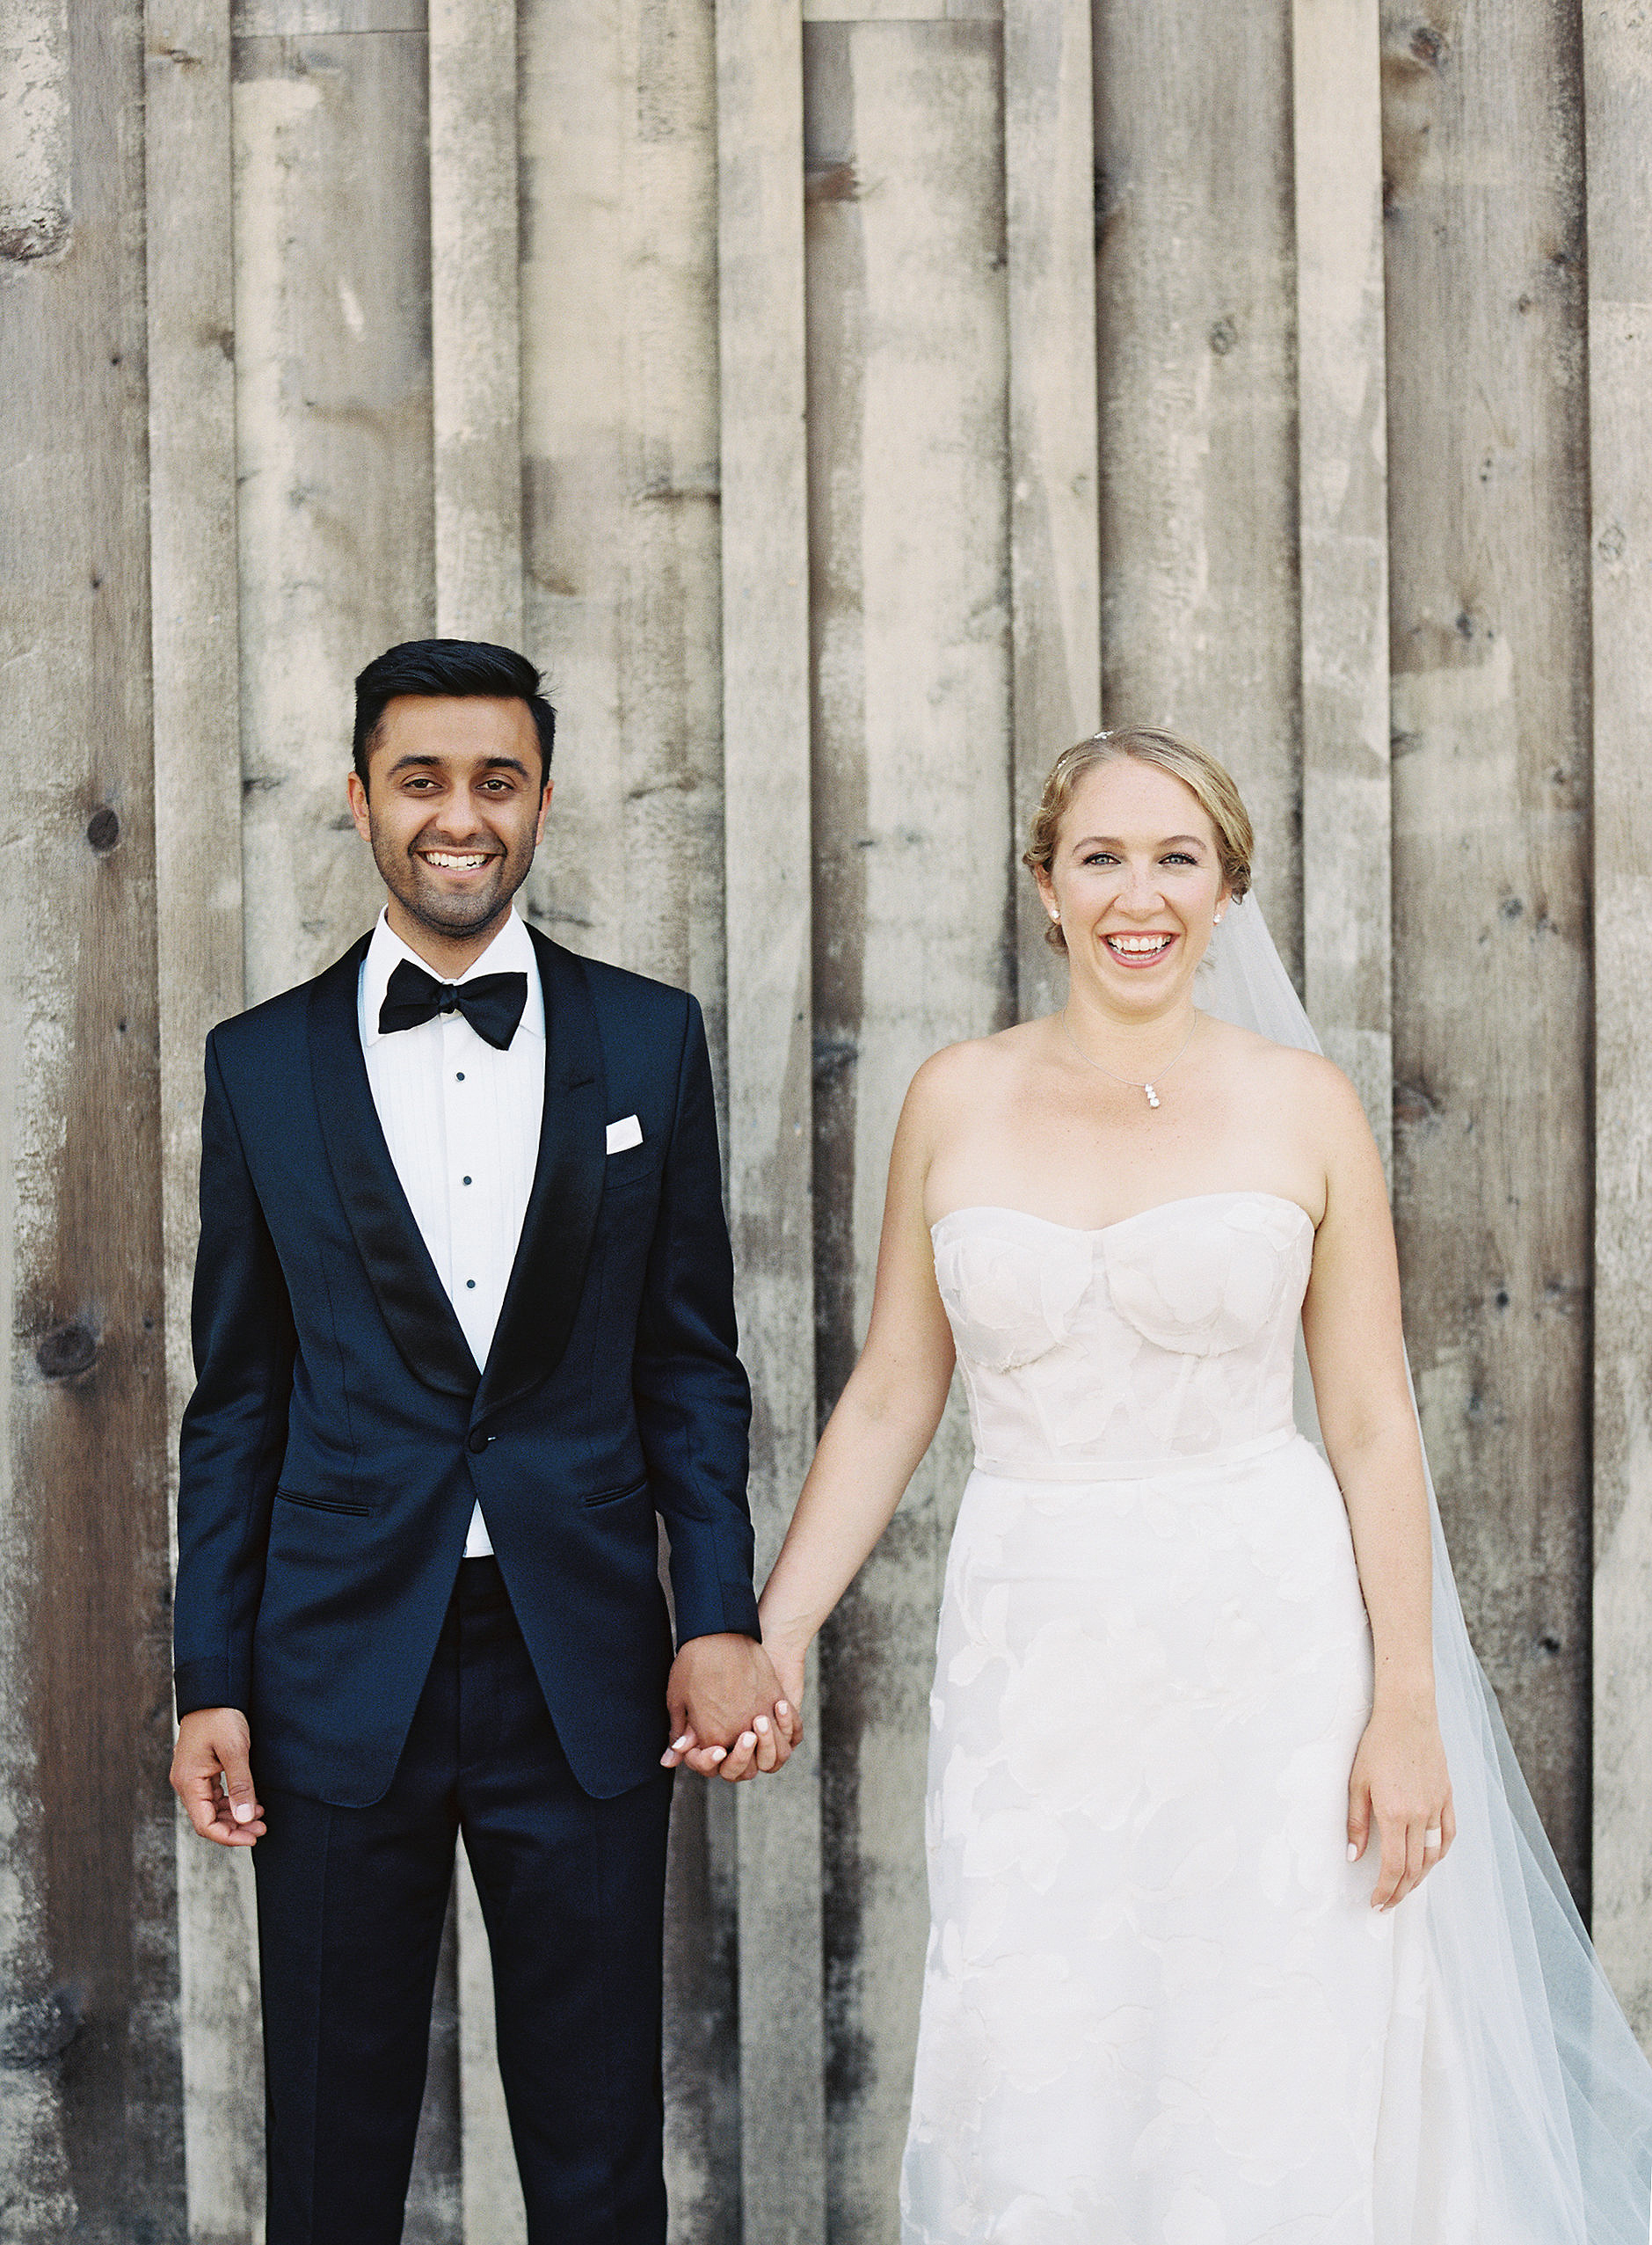 emily siddartha wedding couple bride groom